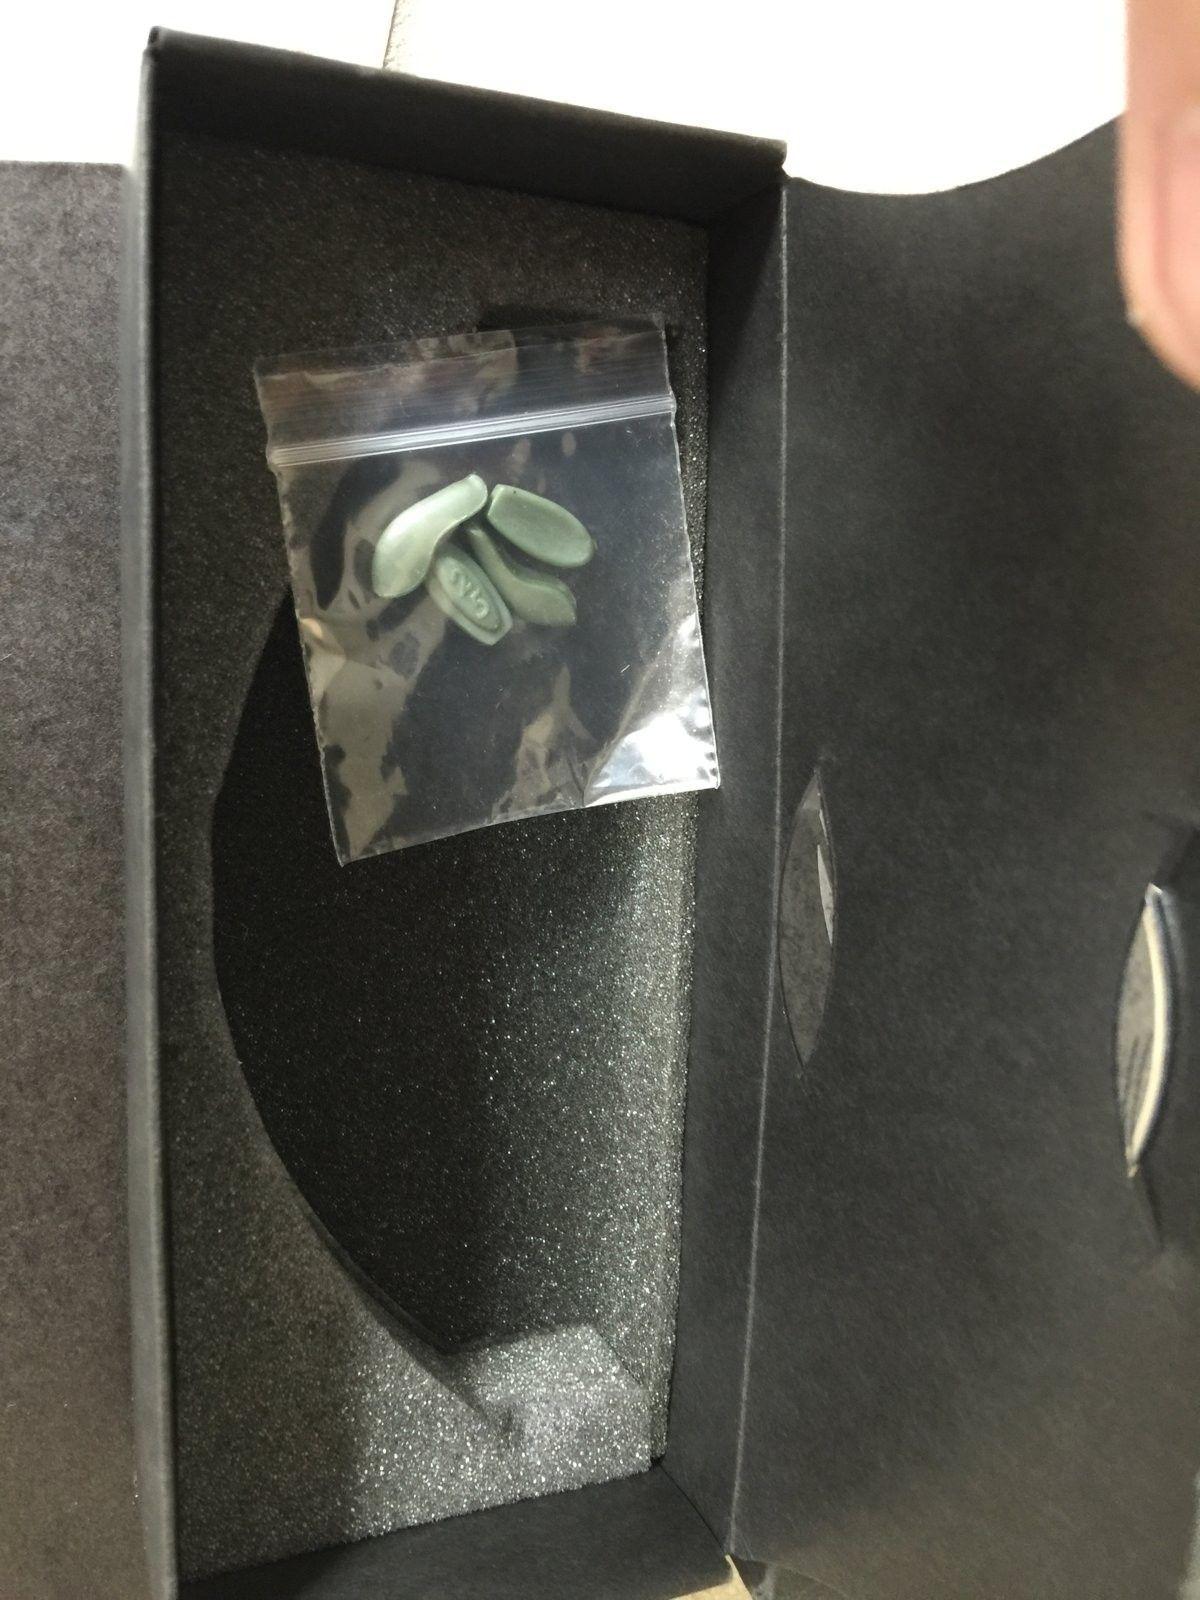 Ichiro polish emerald and killswitch carbon fiber holiday limited - image.jpeg